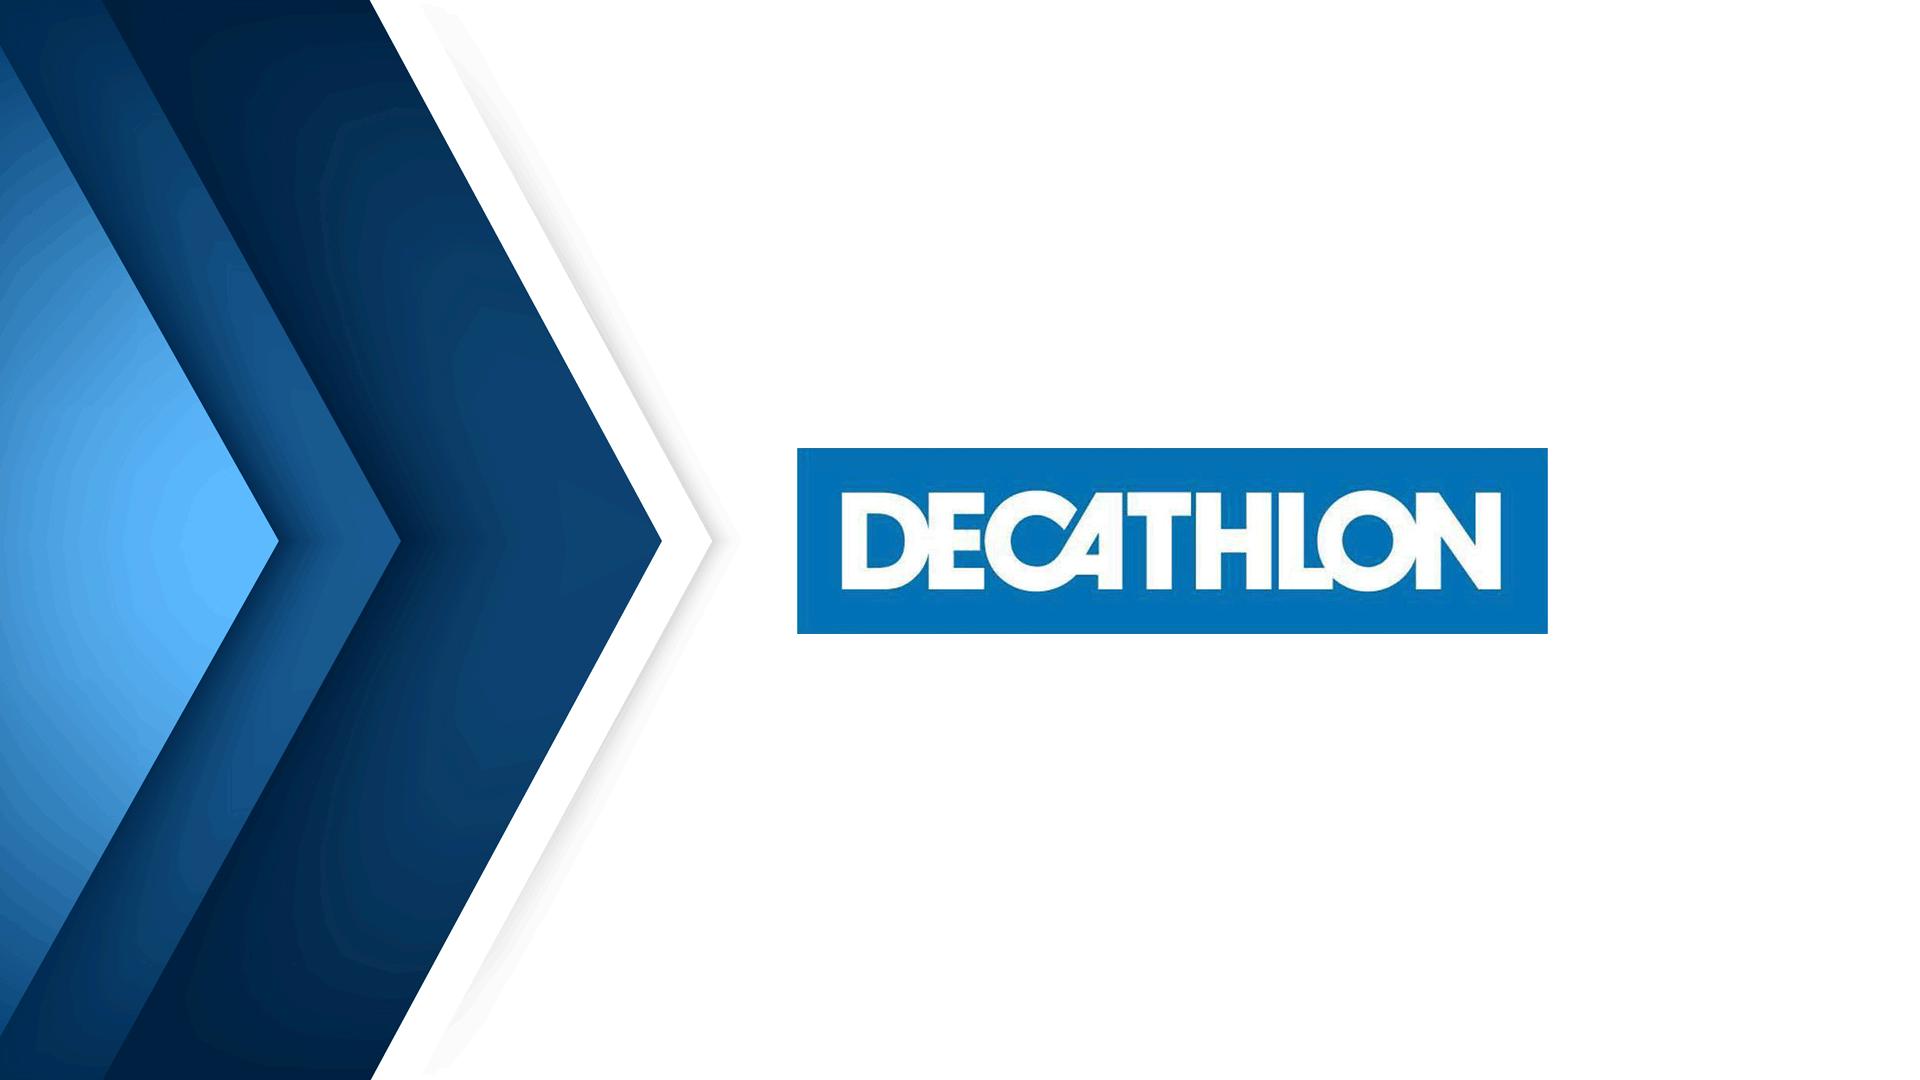 kopzcovernews-decathlon